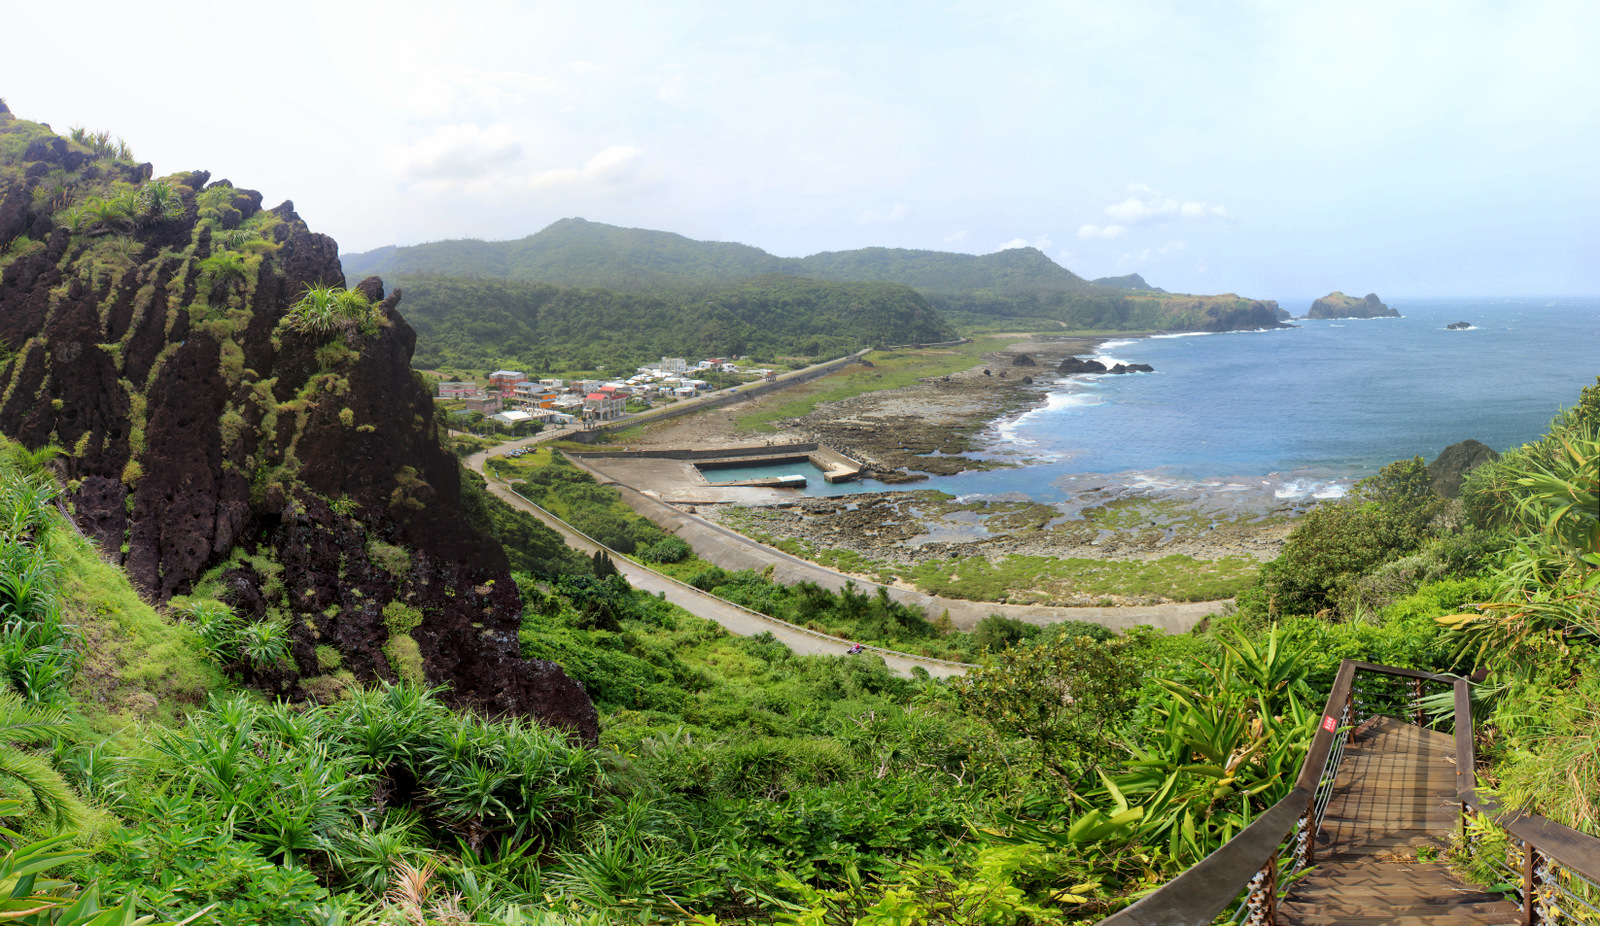 Green Island Taiwan  city pictures gallery : Green Island, Taiwan | ZAC GORELL